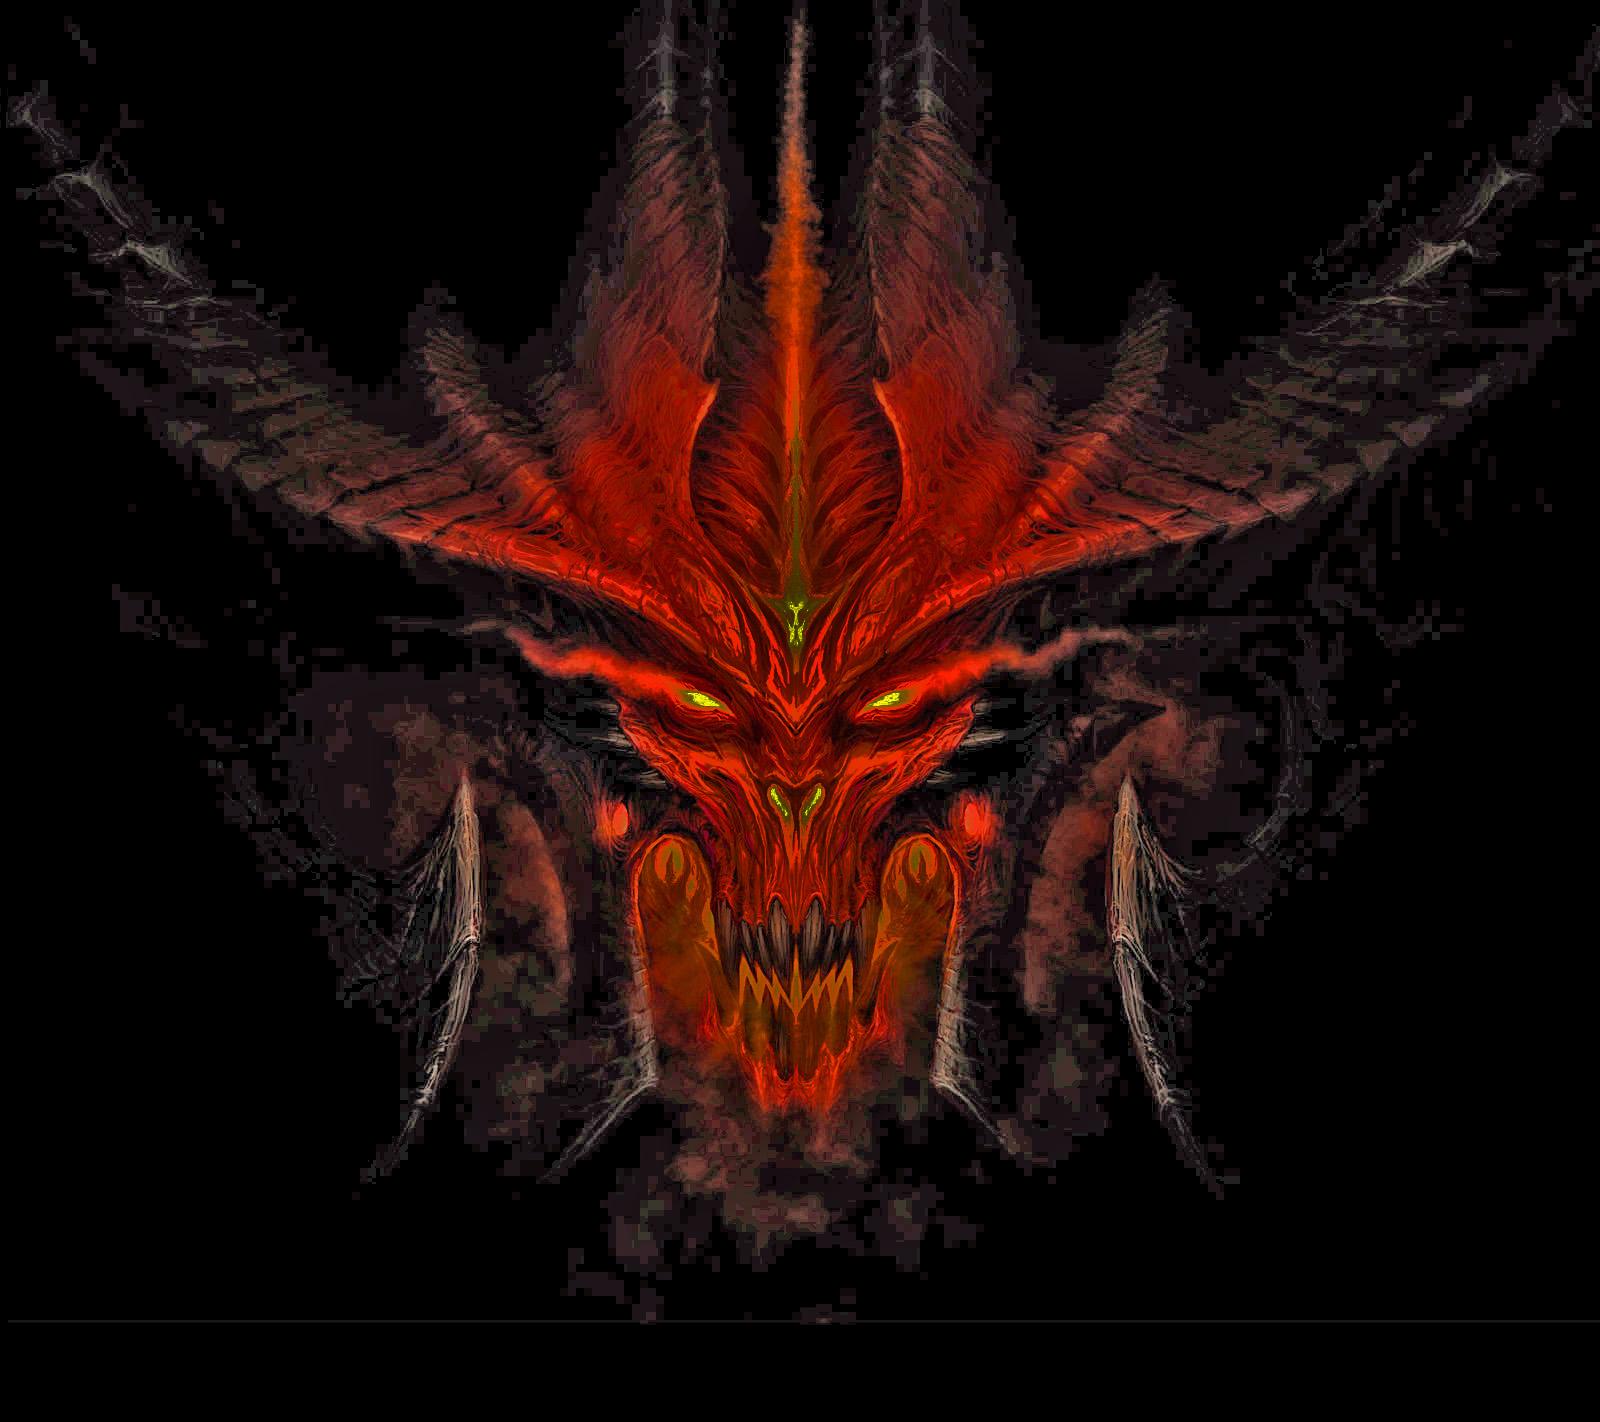 Diablo 3 Wallpaper 1920x1080: Image - Diablo Head1.jpg